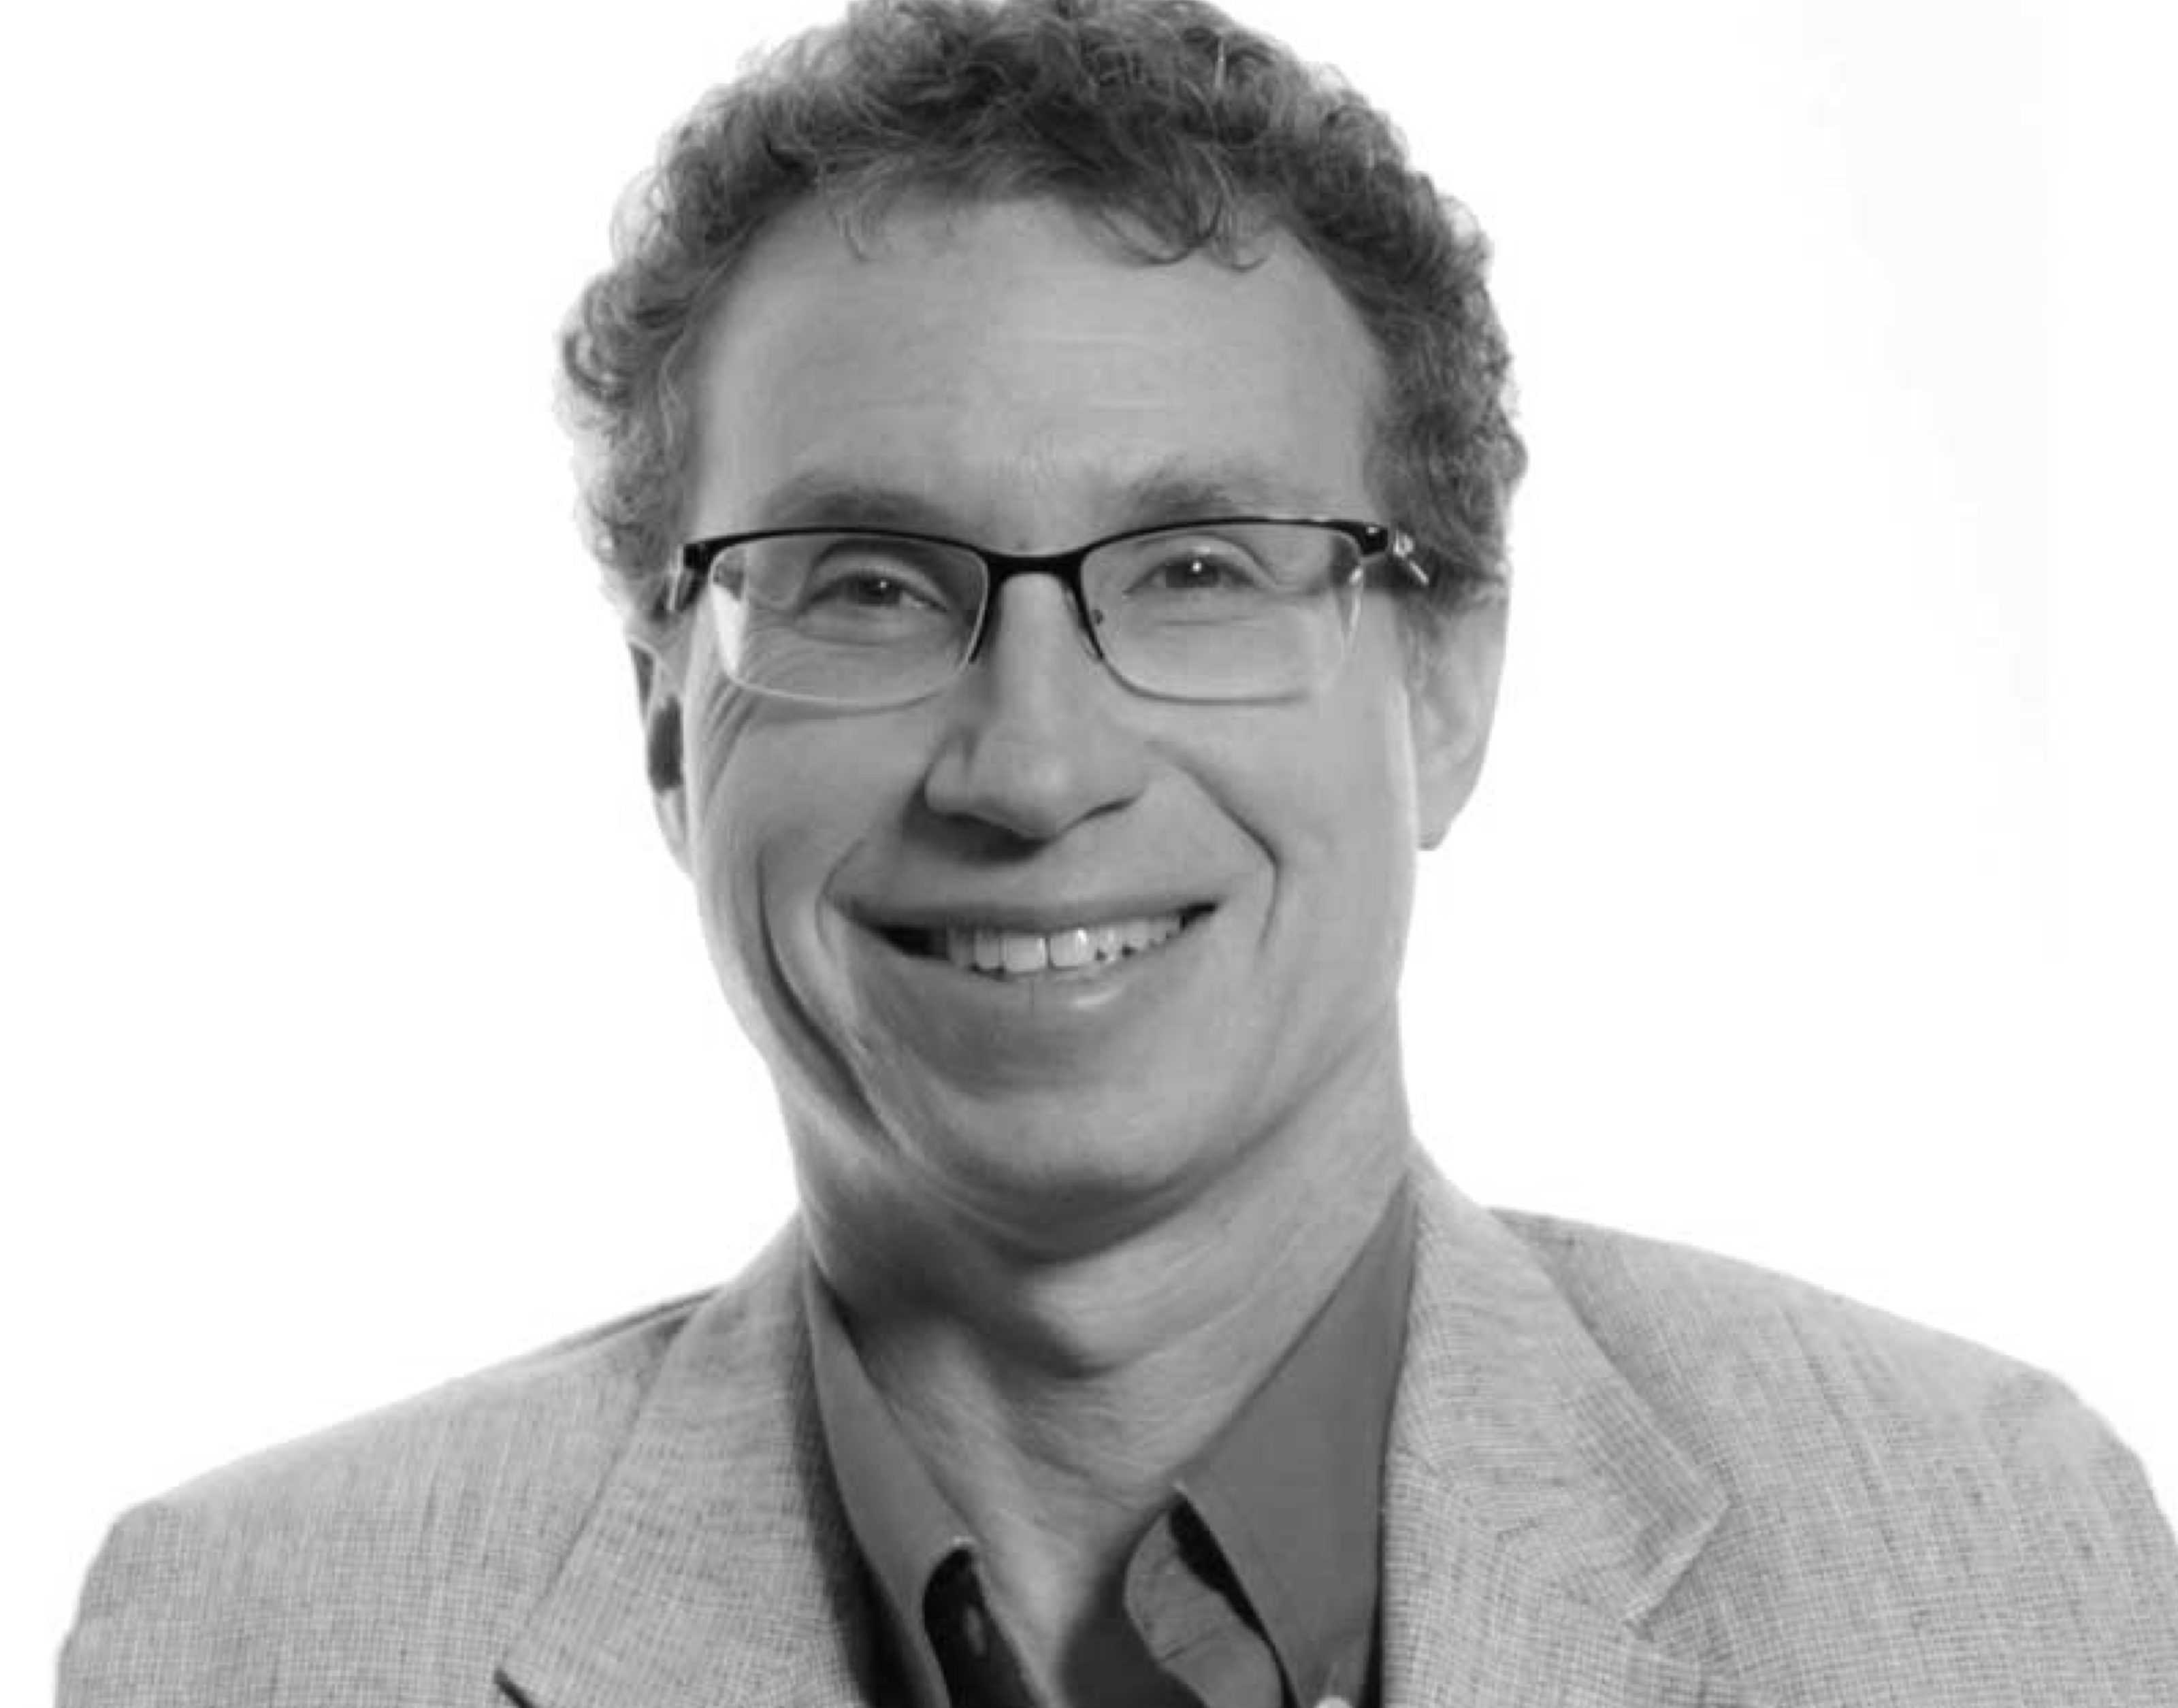 Dr. Andy Newberg